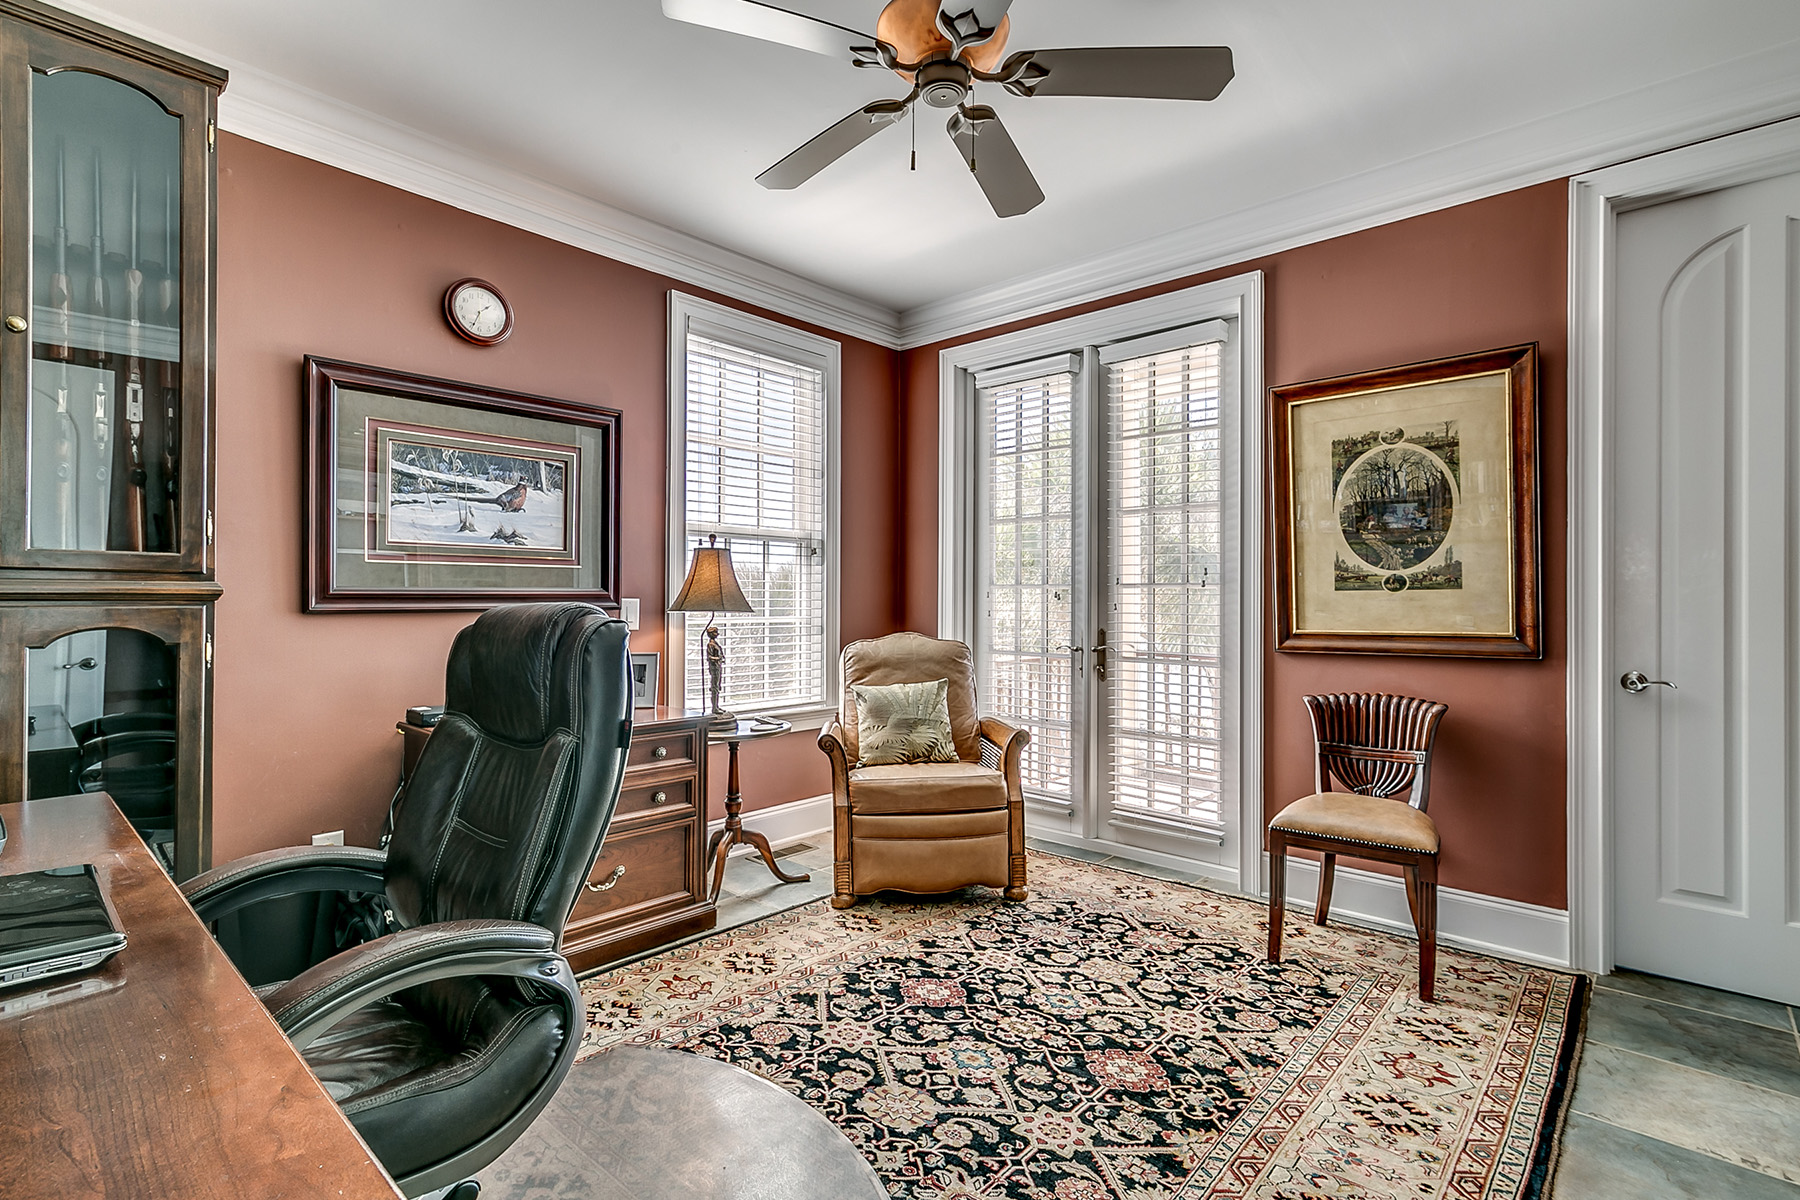 Additional photo for property listing at 1345 Norris Drive, Pawleys Island, SC 29585 1345  Norris Drive Pawleys Island, Carolina Del Sur 29585 Estados Unidos